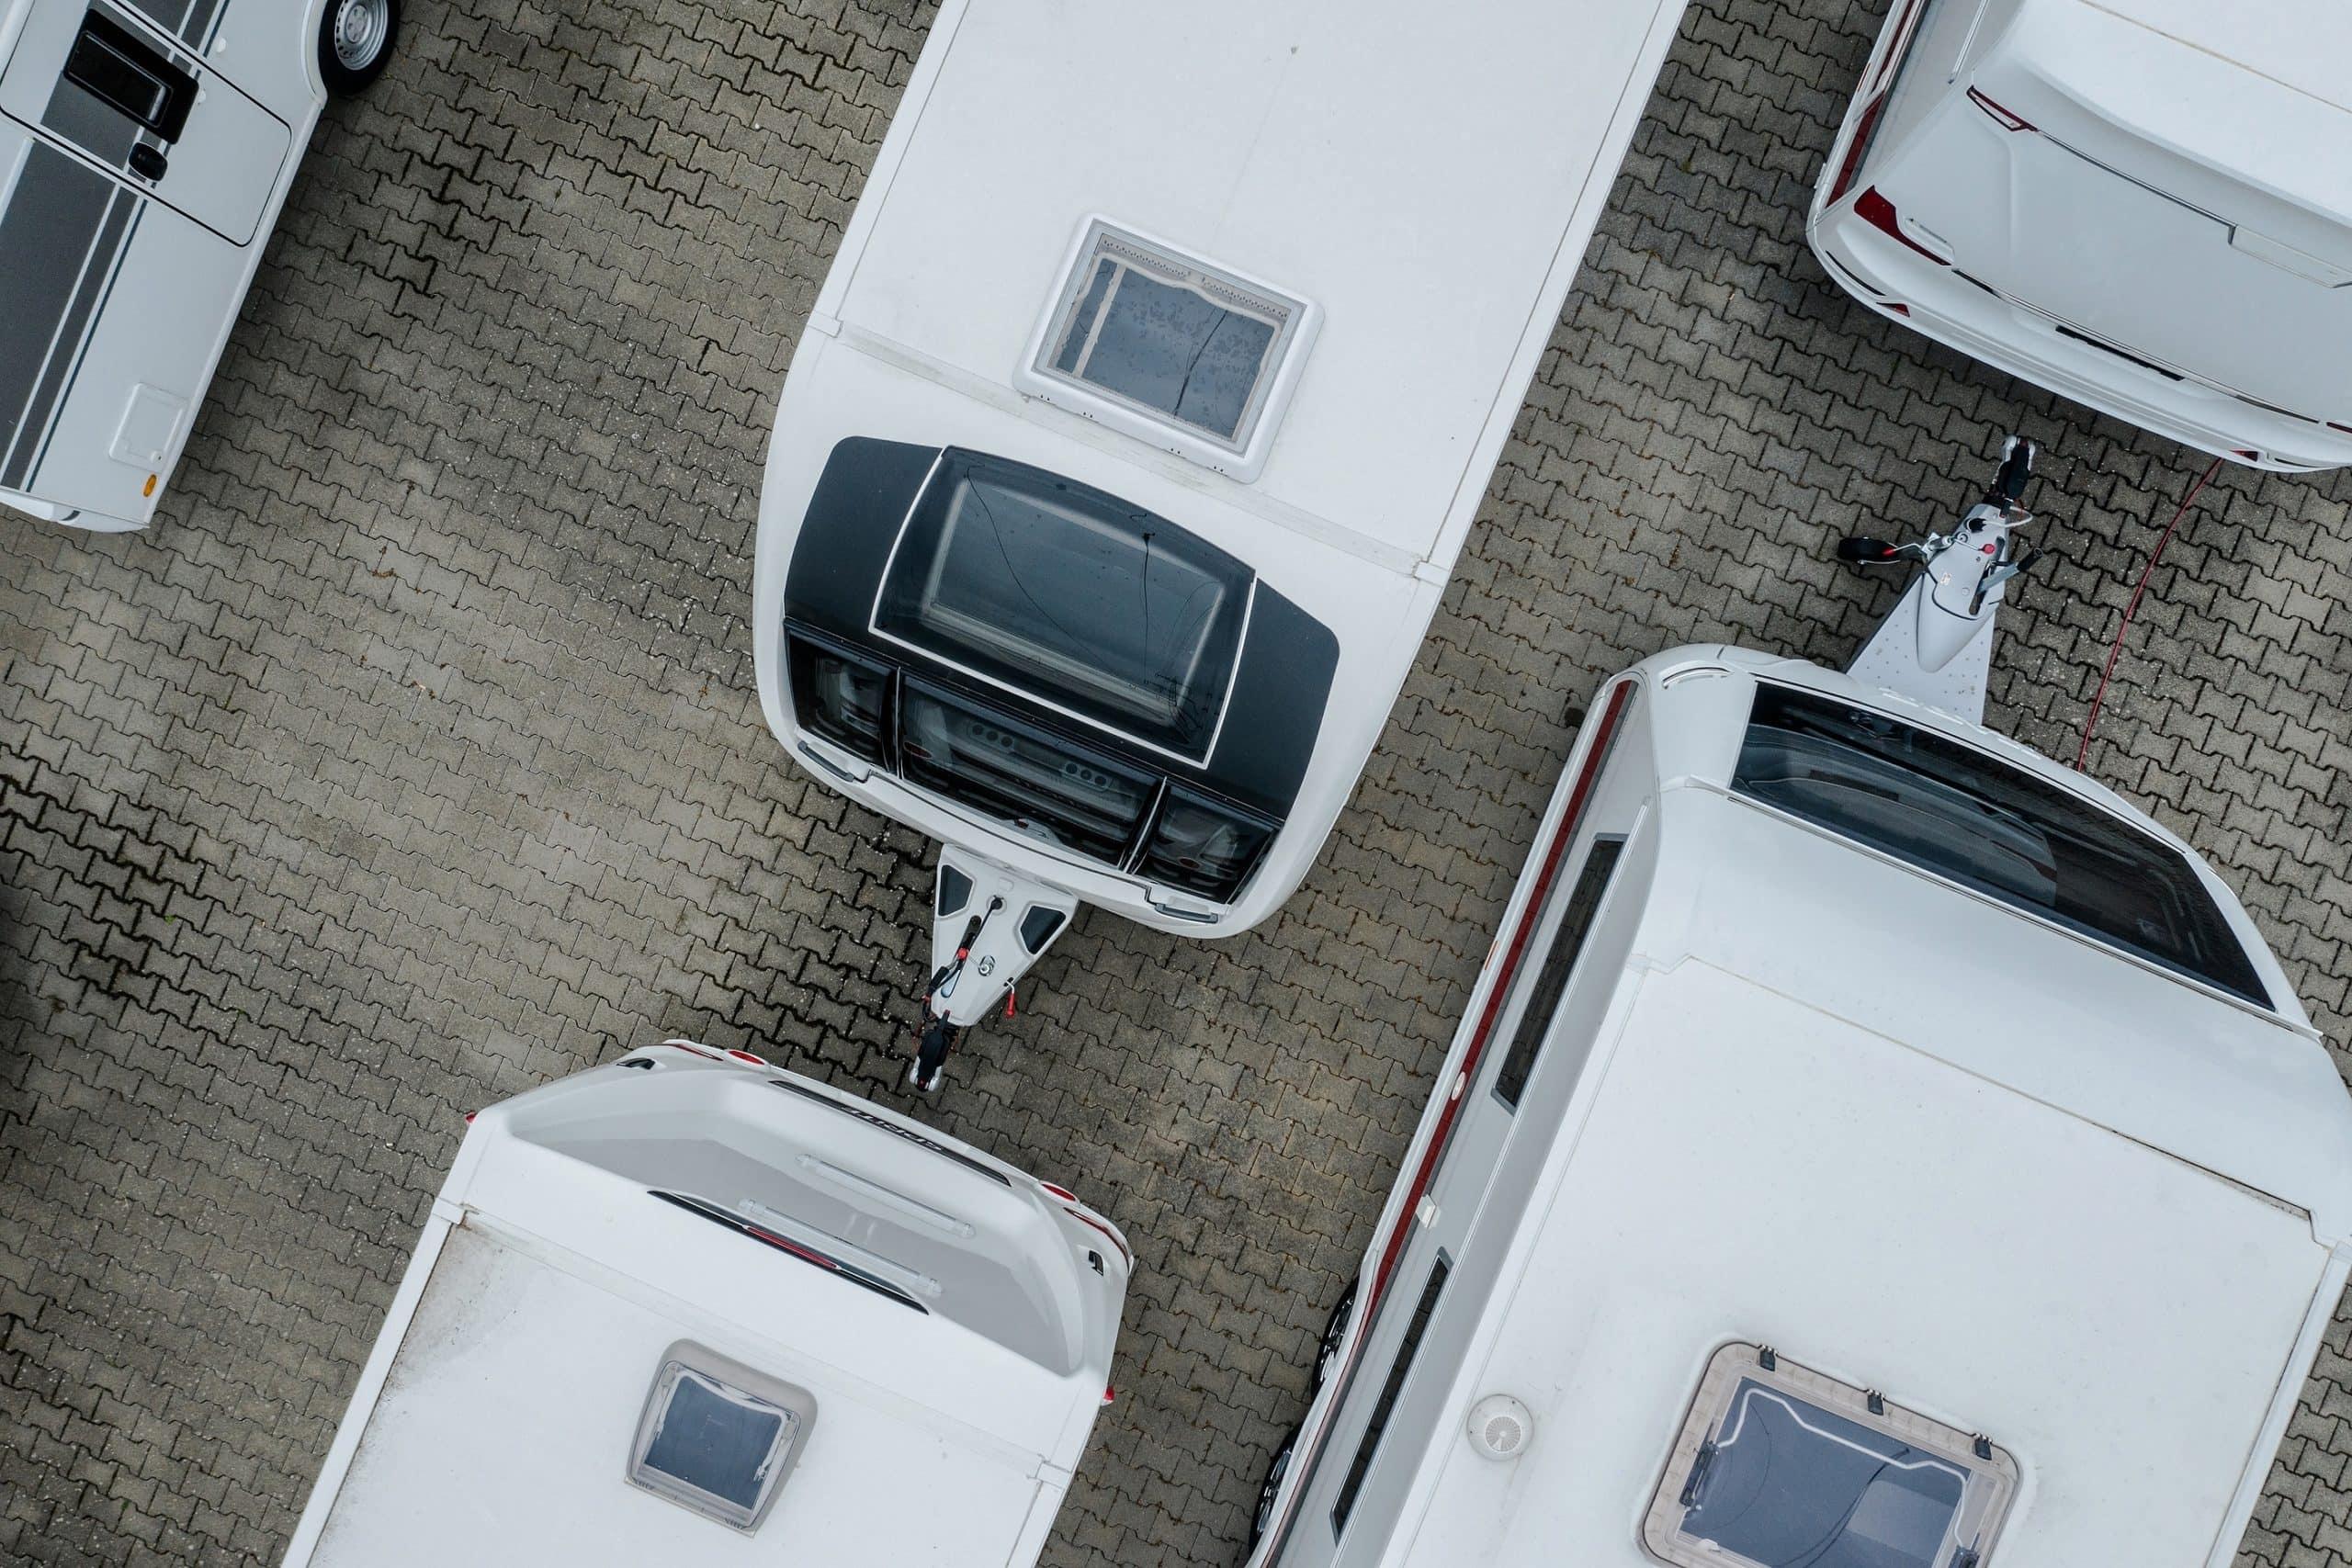 Birdseye View Of Trailers And Motorhomes